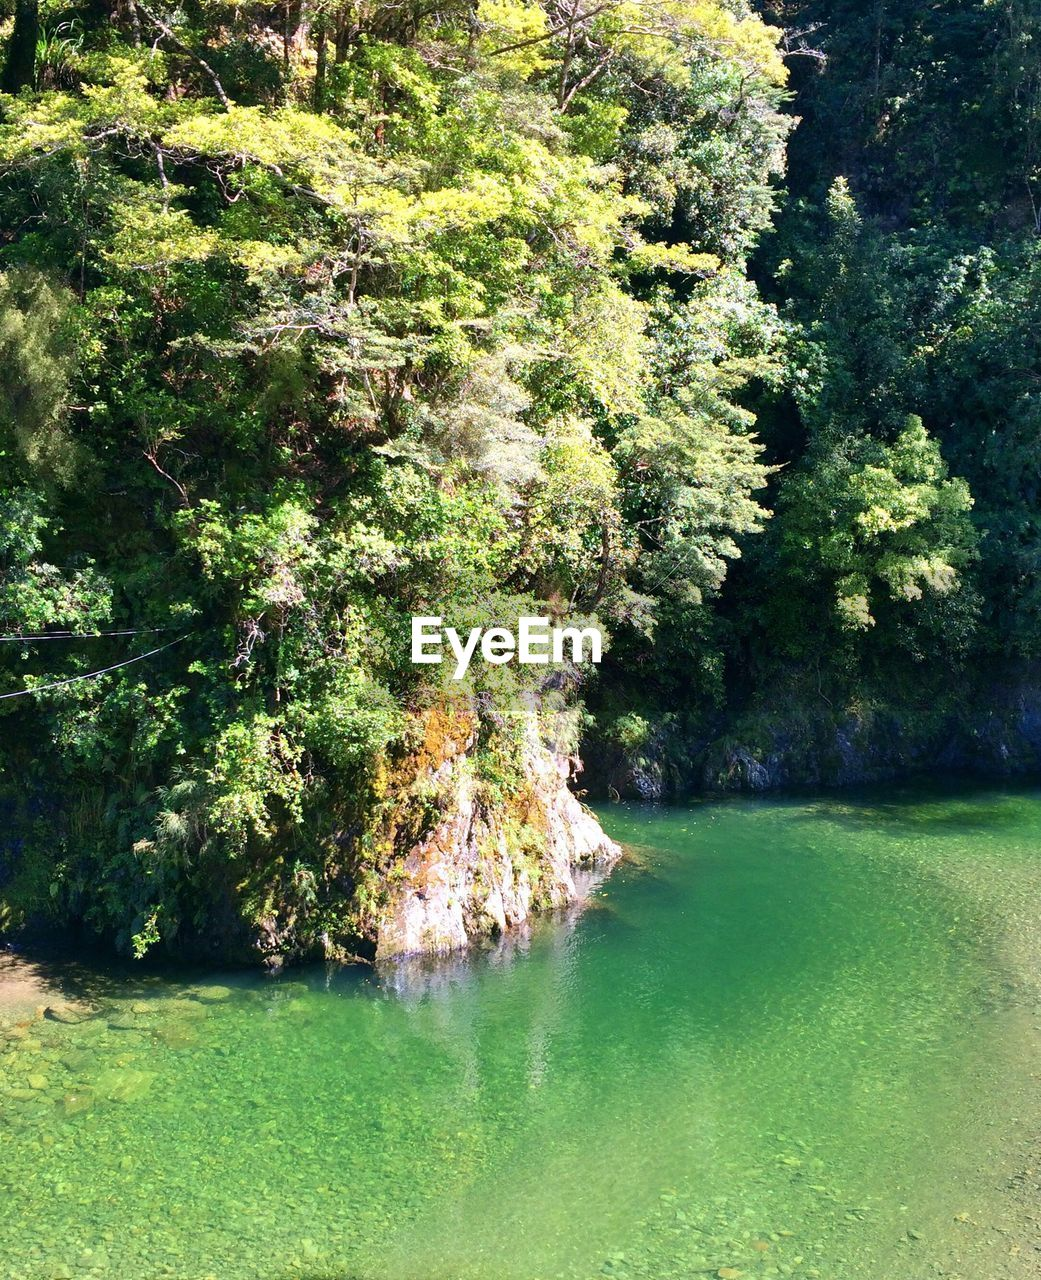 Overgrown rock in still green water